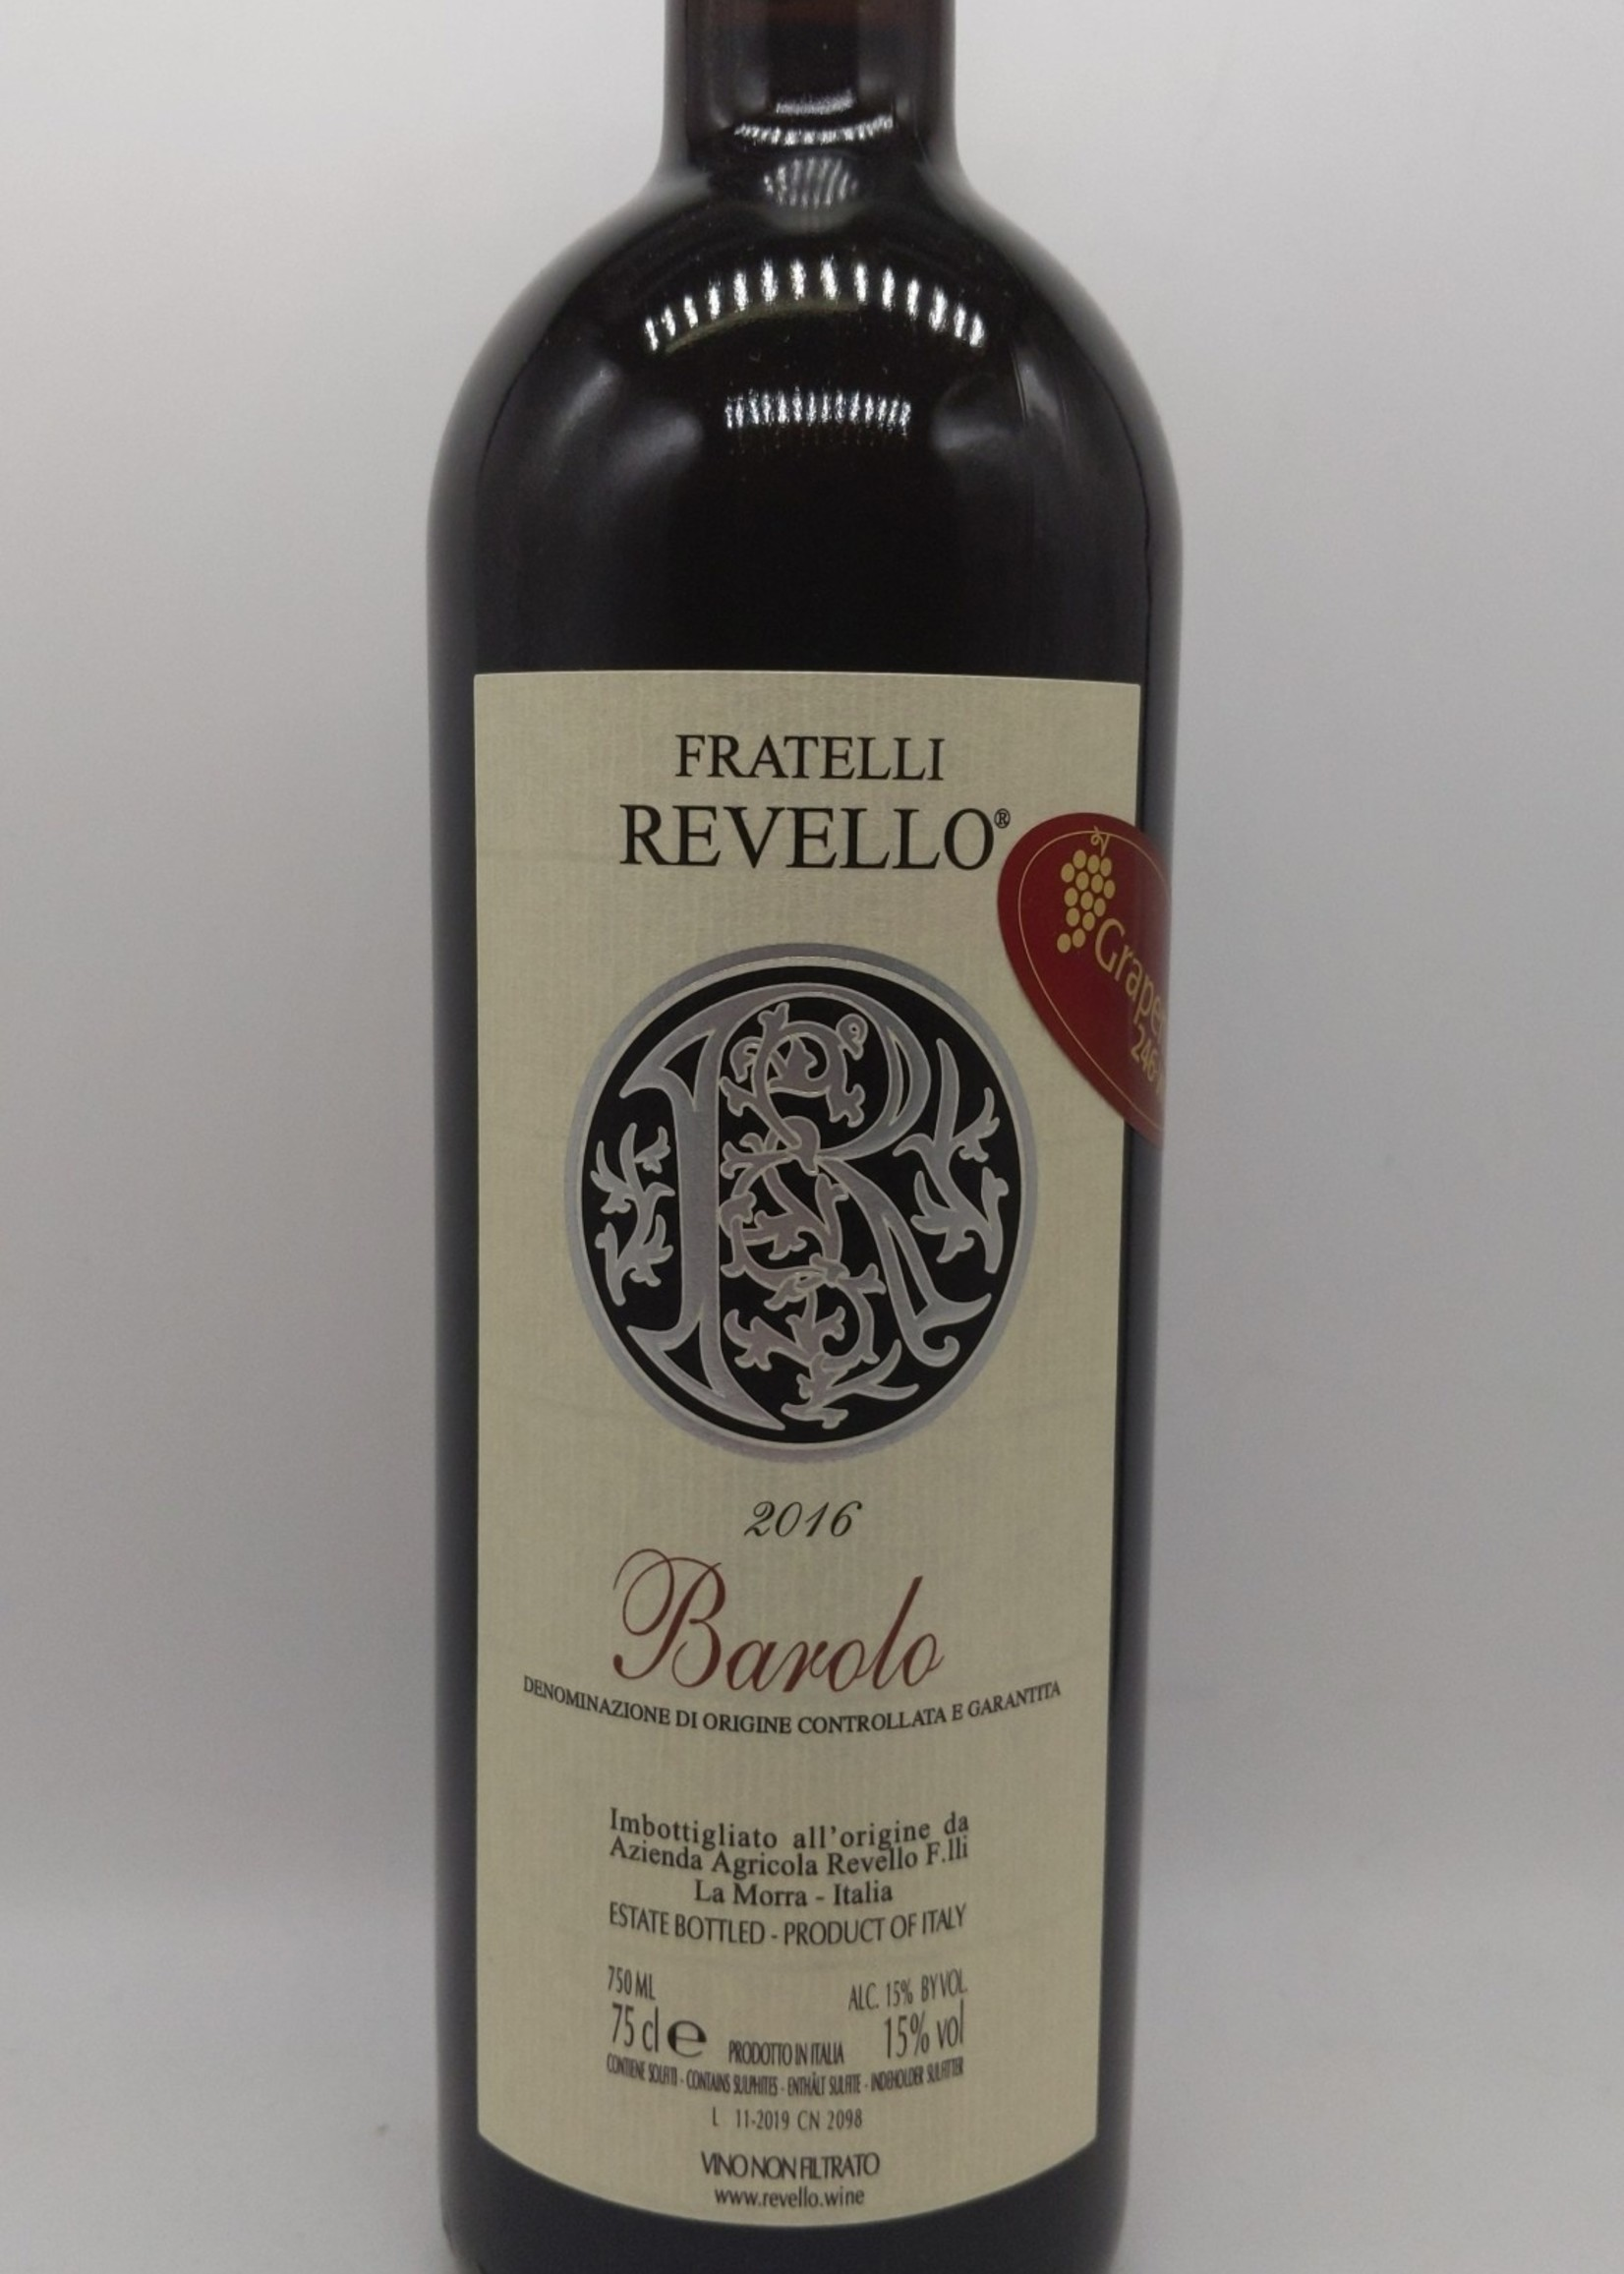 2016 FRATELLI REVELLO BAROLO 750ml